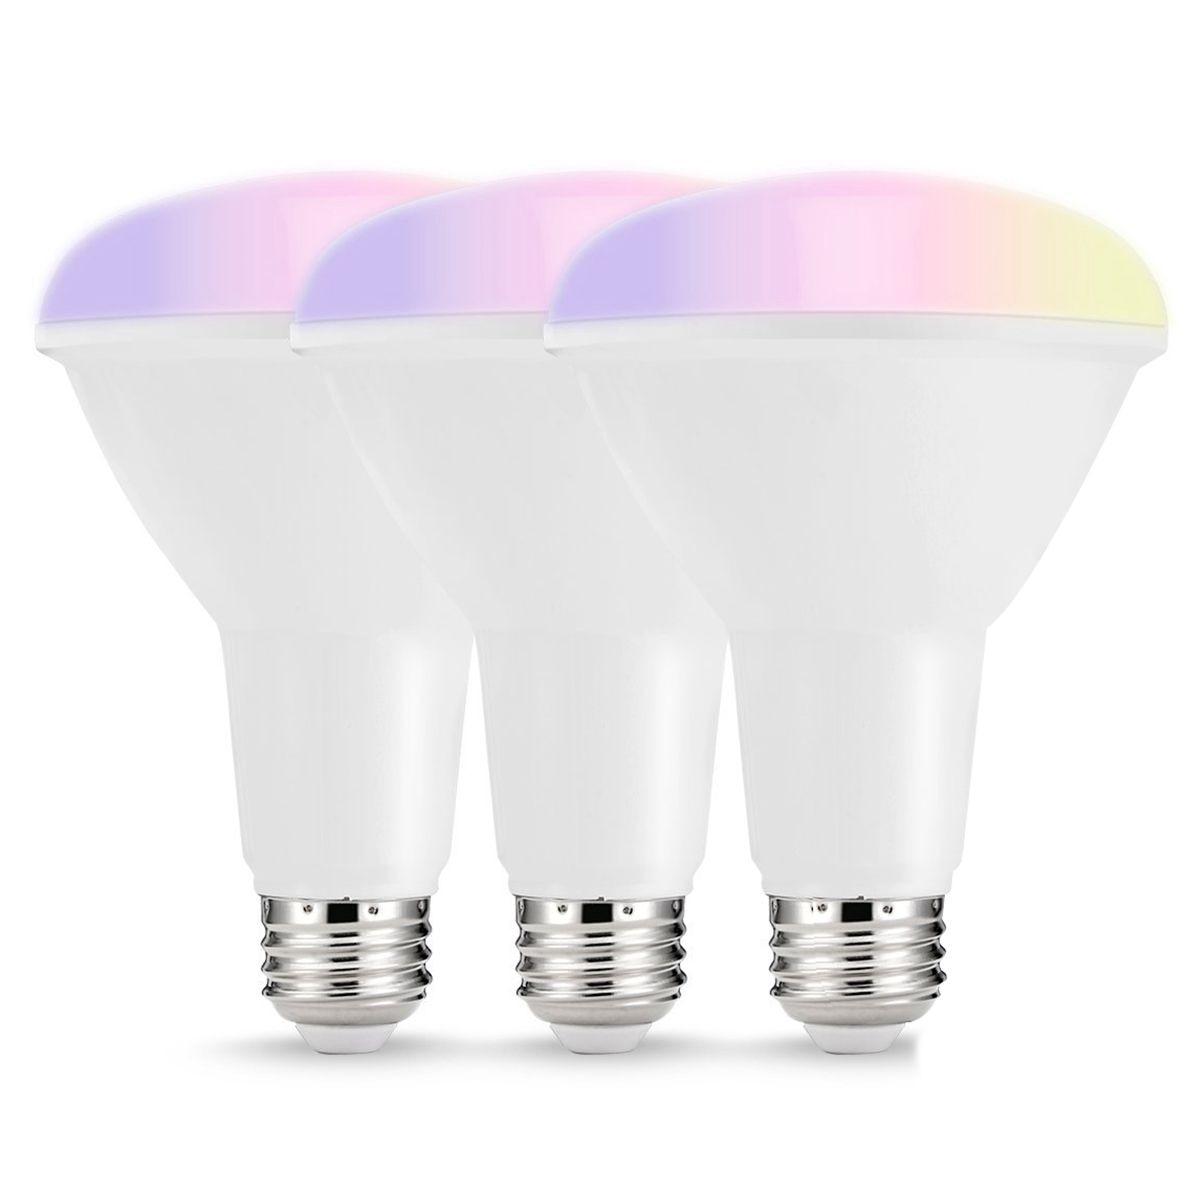 SHGO-Smart LED Bulbs Multicolored WIFI LED Lights  BR30 Dimmable Recessed Light Bulbs  75W-80W Equivalent Flood Light title=